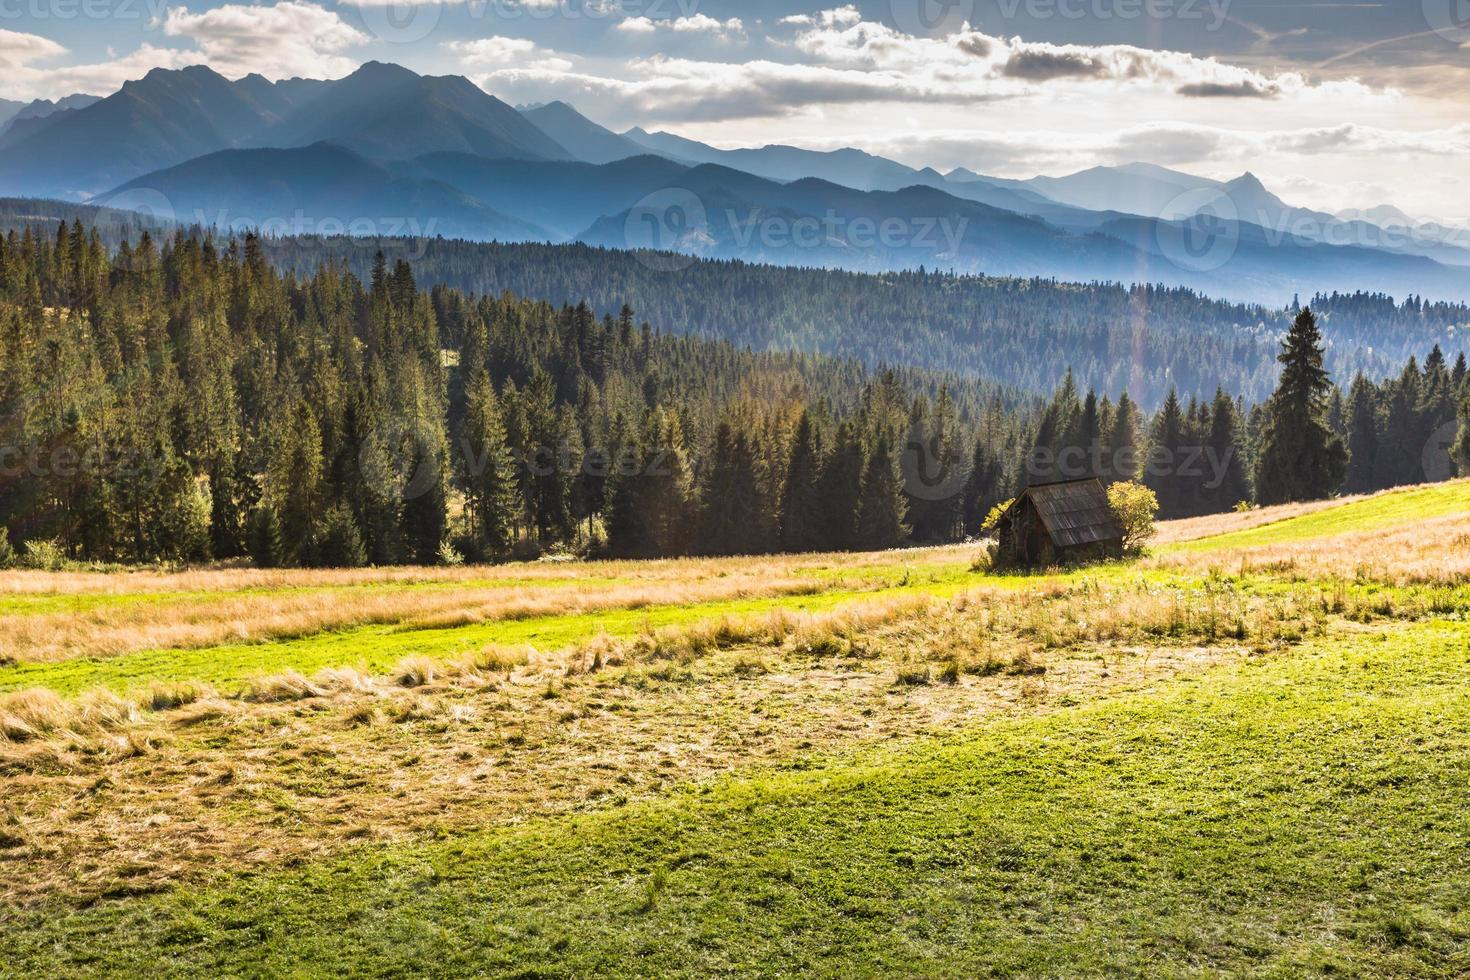 Berge Landschaft.Tatra Berge, Polen. foto